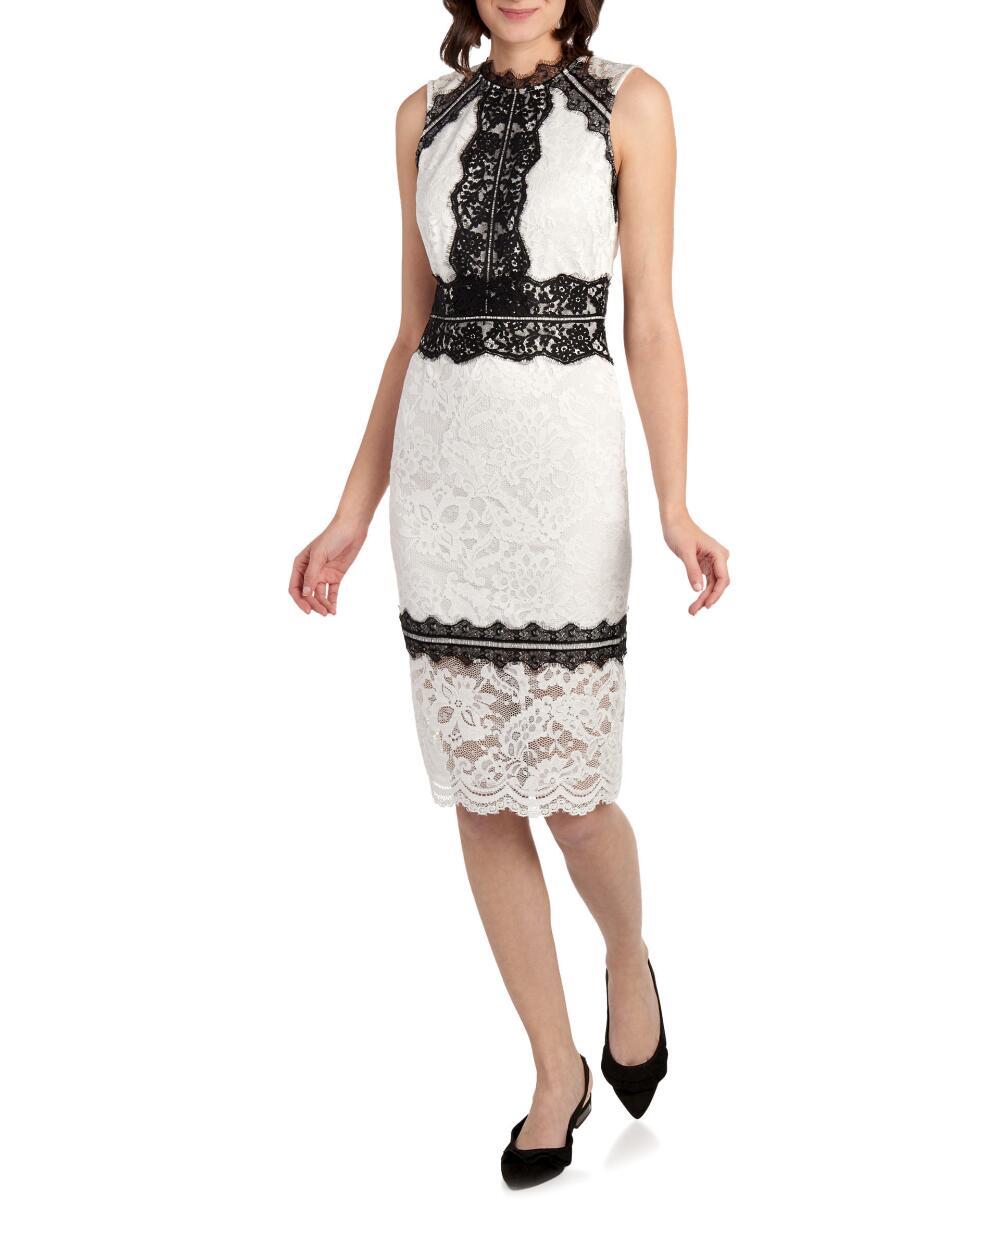 Bebe Contrasting Lace Sleeveless Sheath Dress | Hermosaz